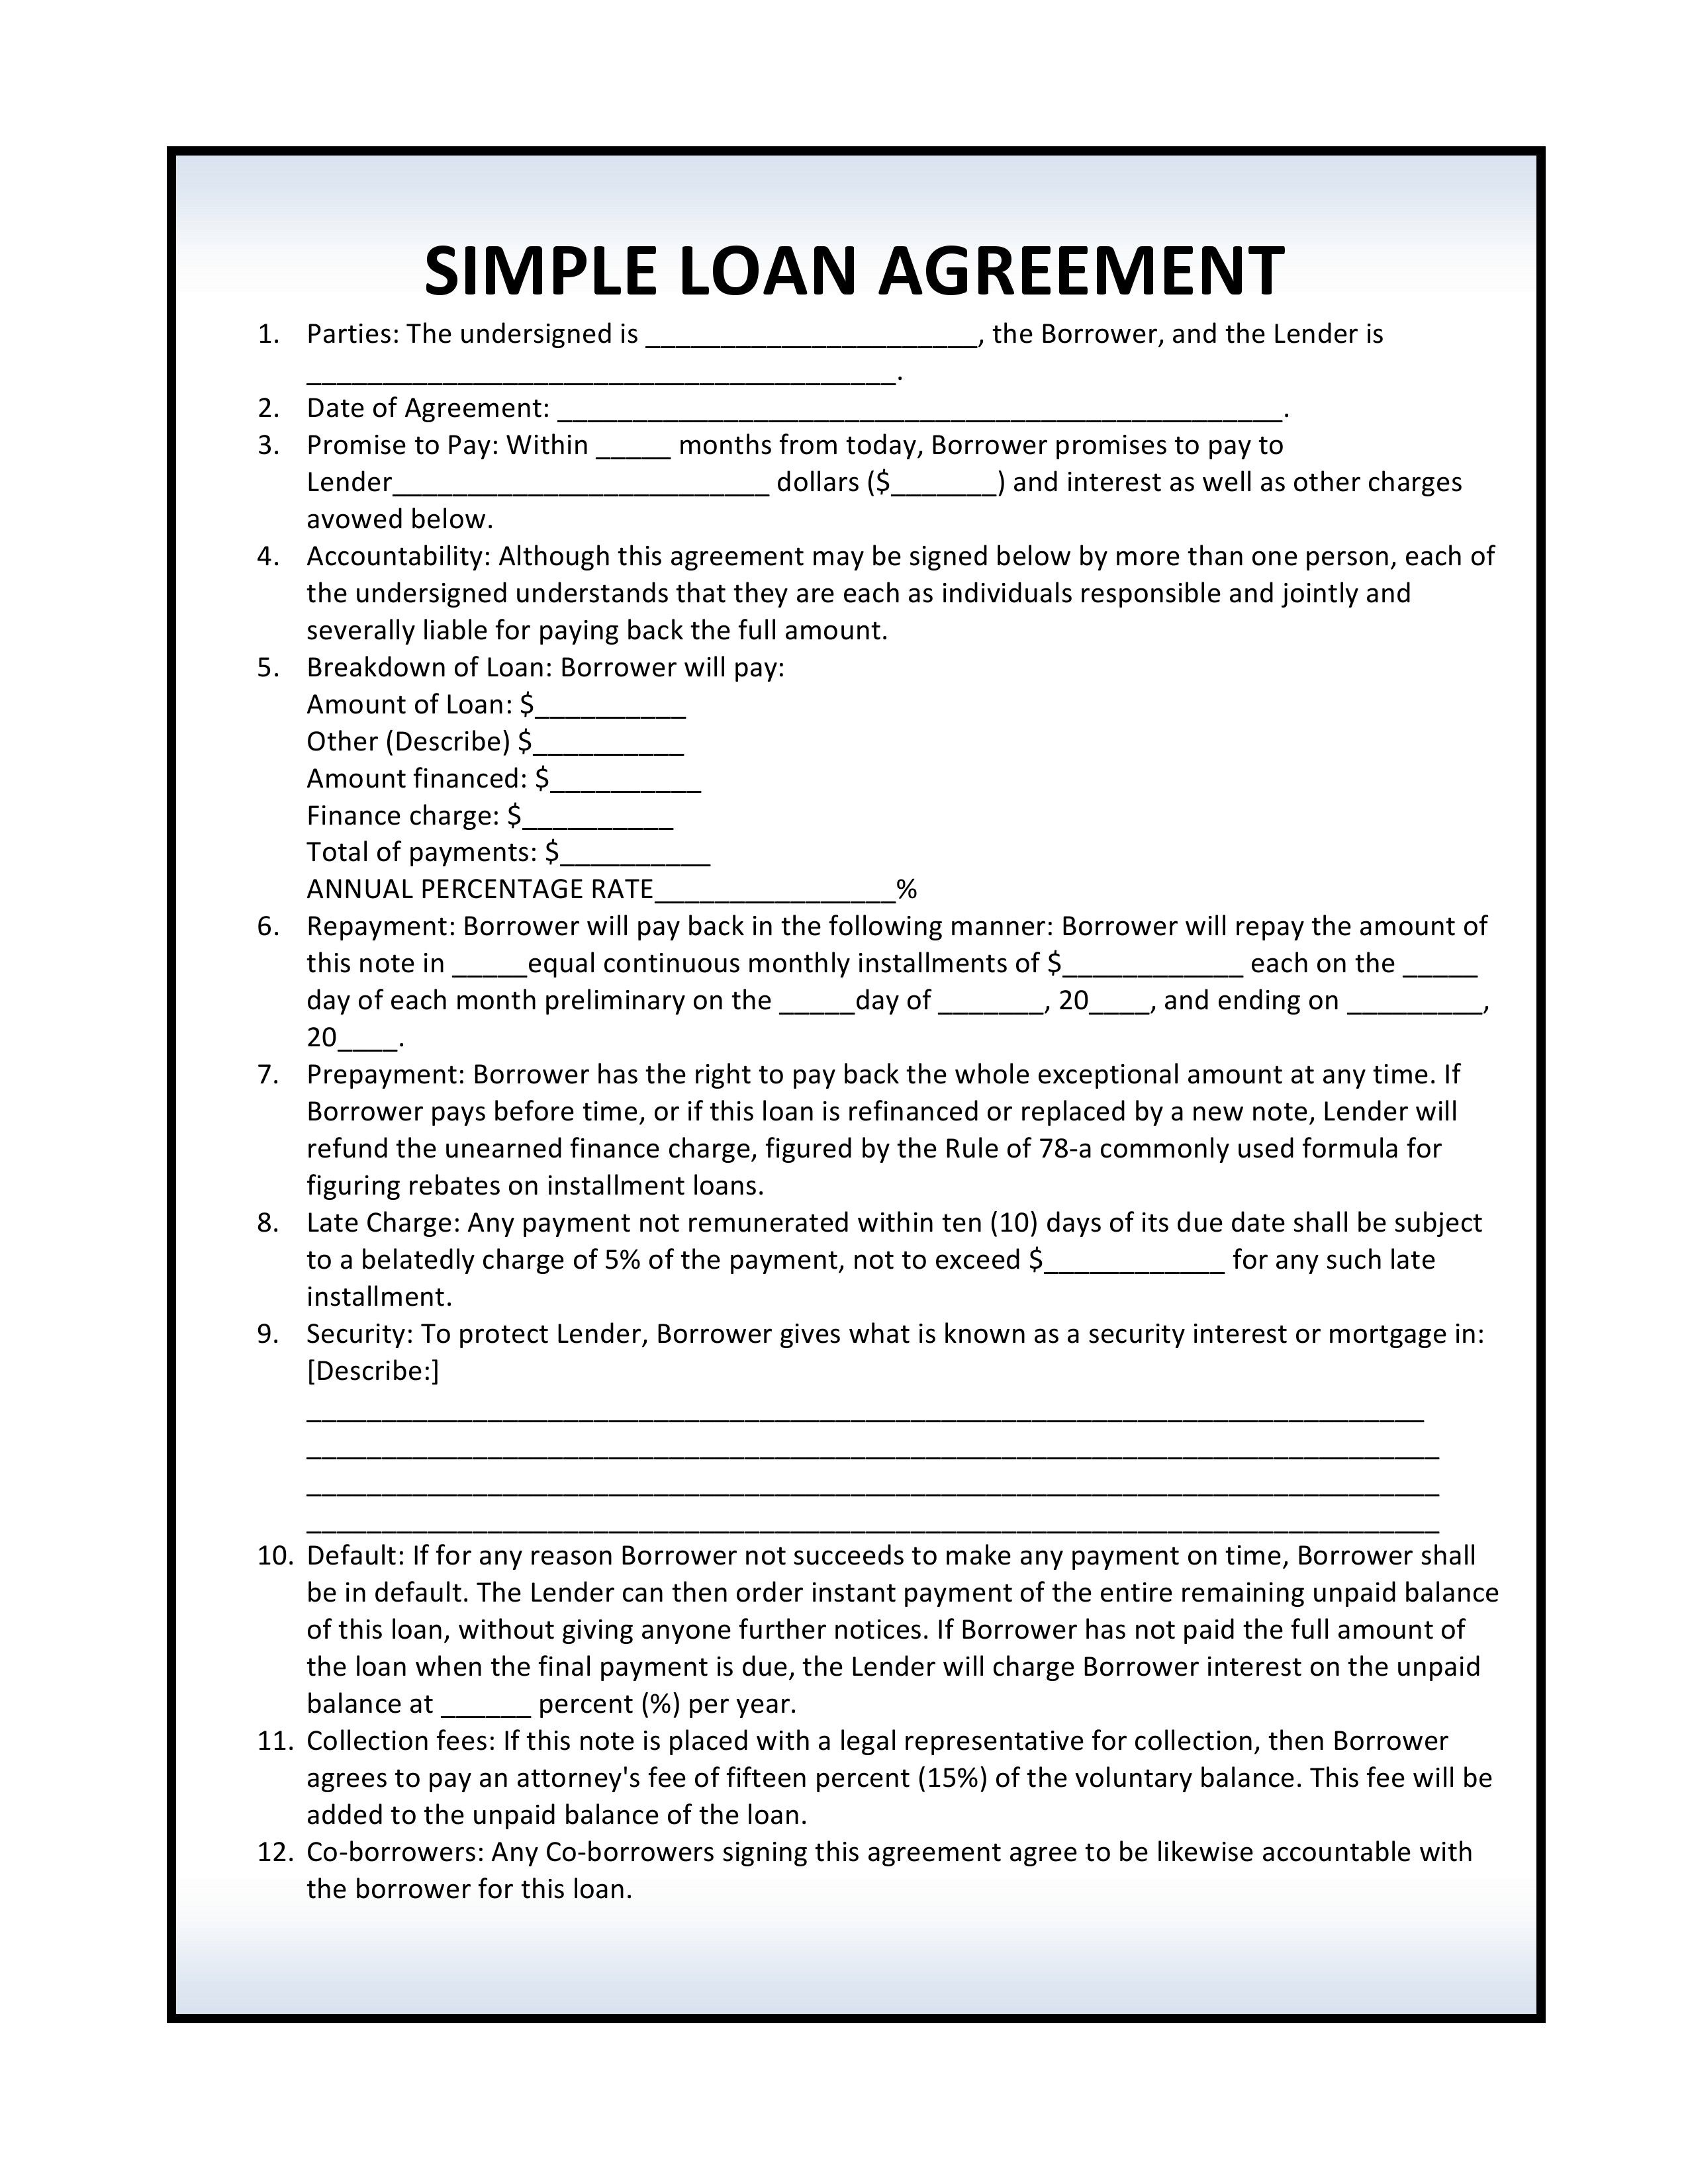 Free Simple Loan Agreement